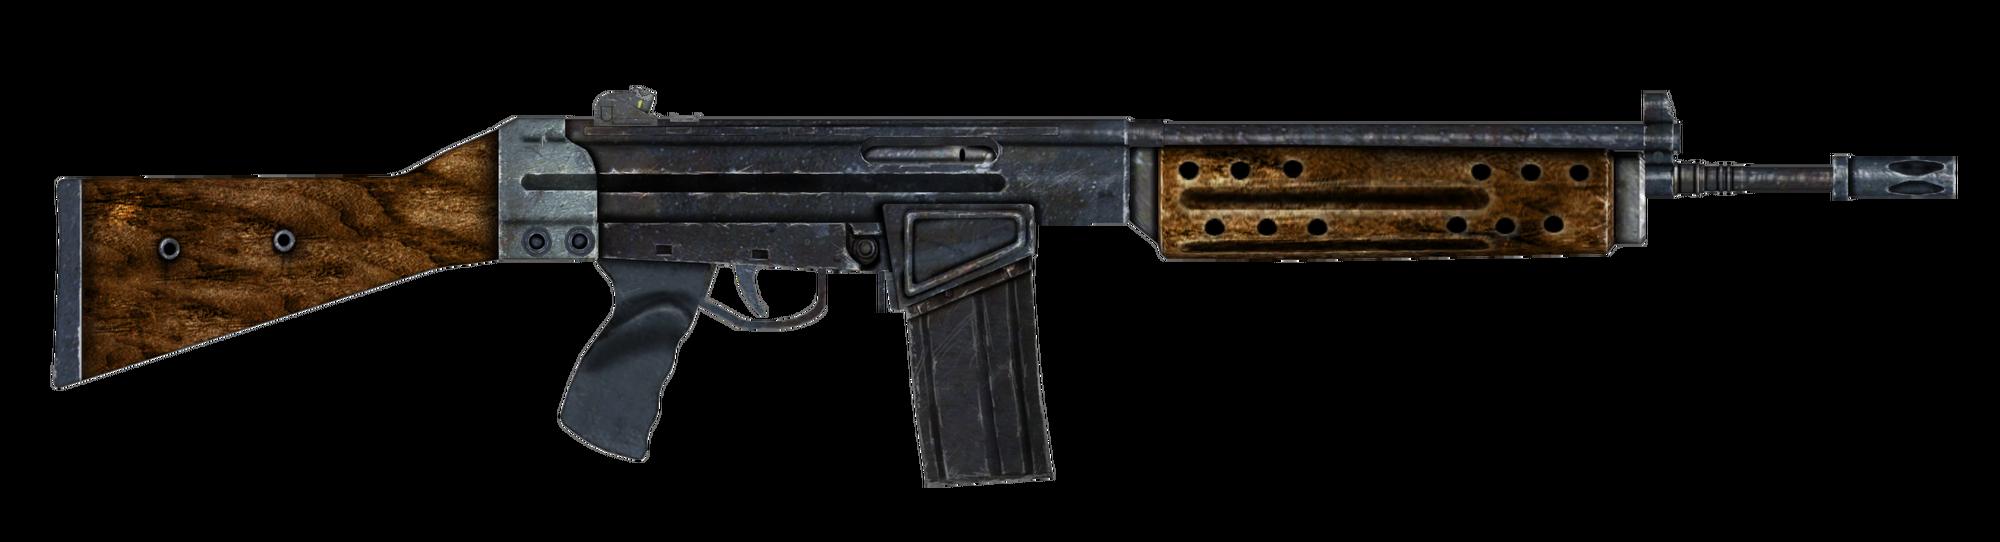 Assault rifle | Fallout Wiki | FANDOM powered by Wikia